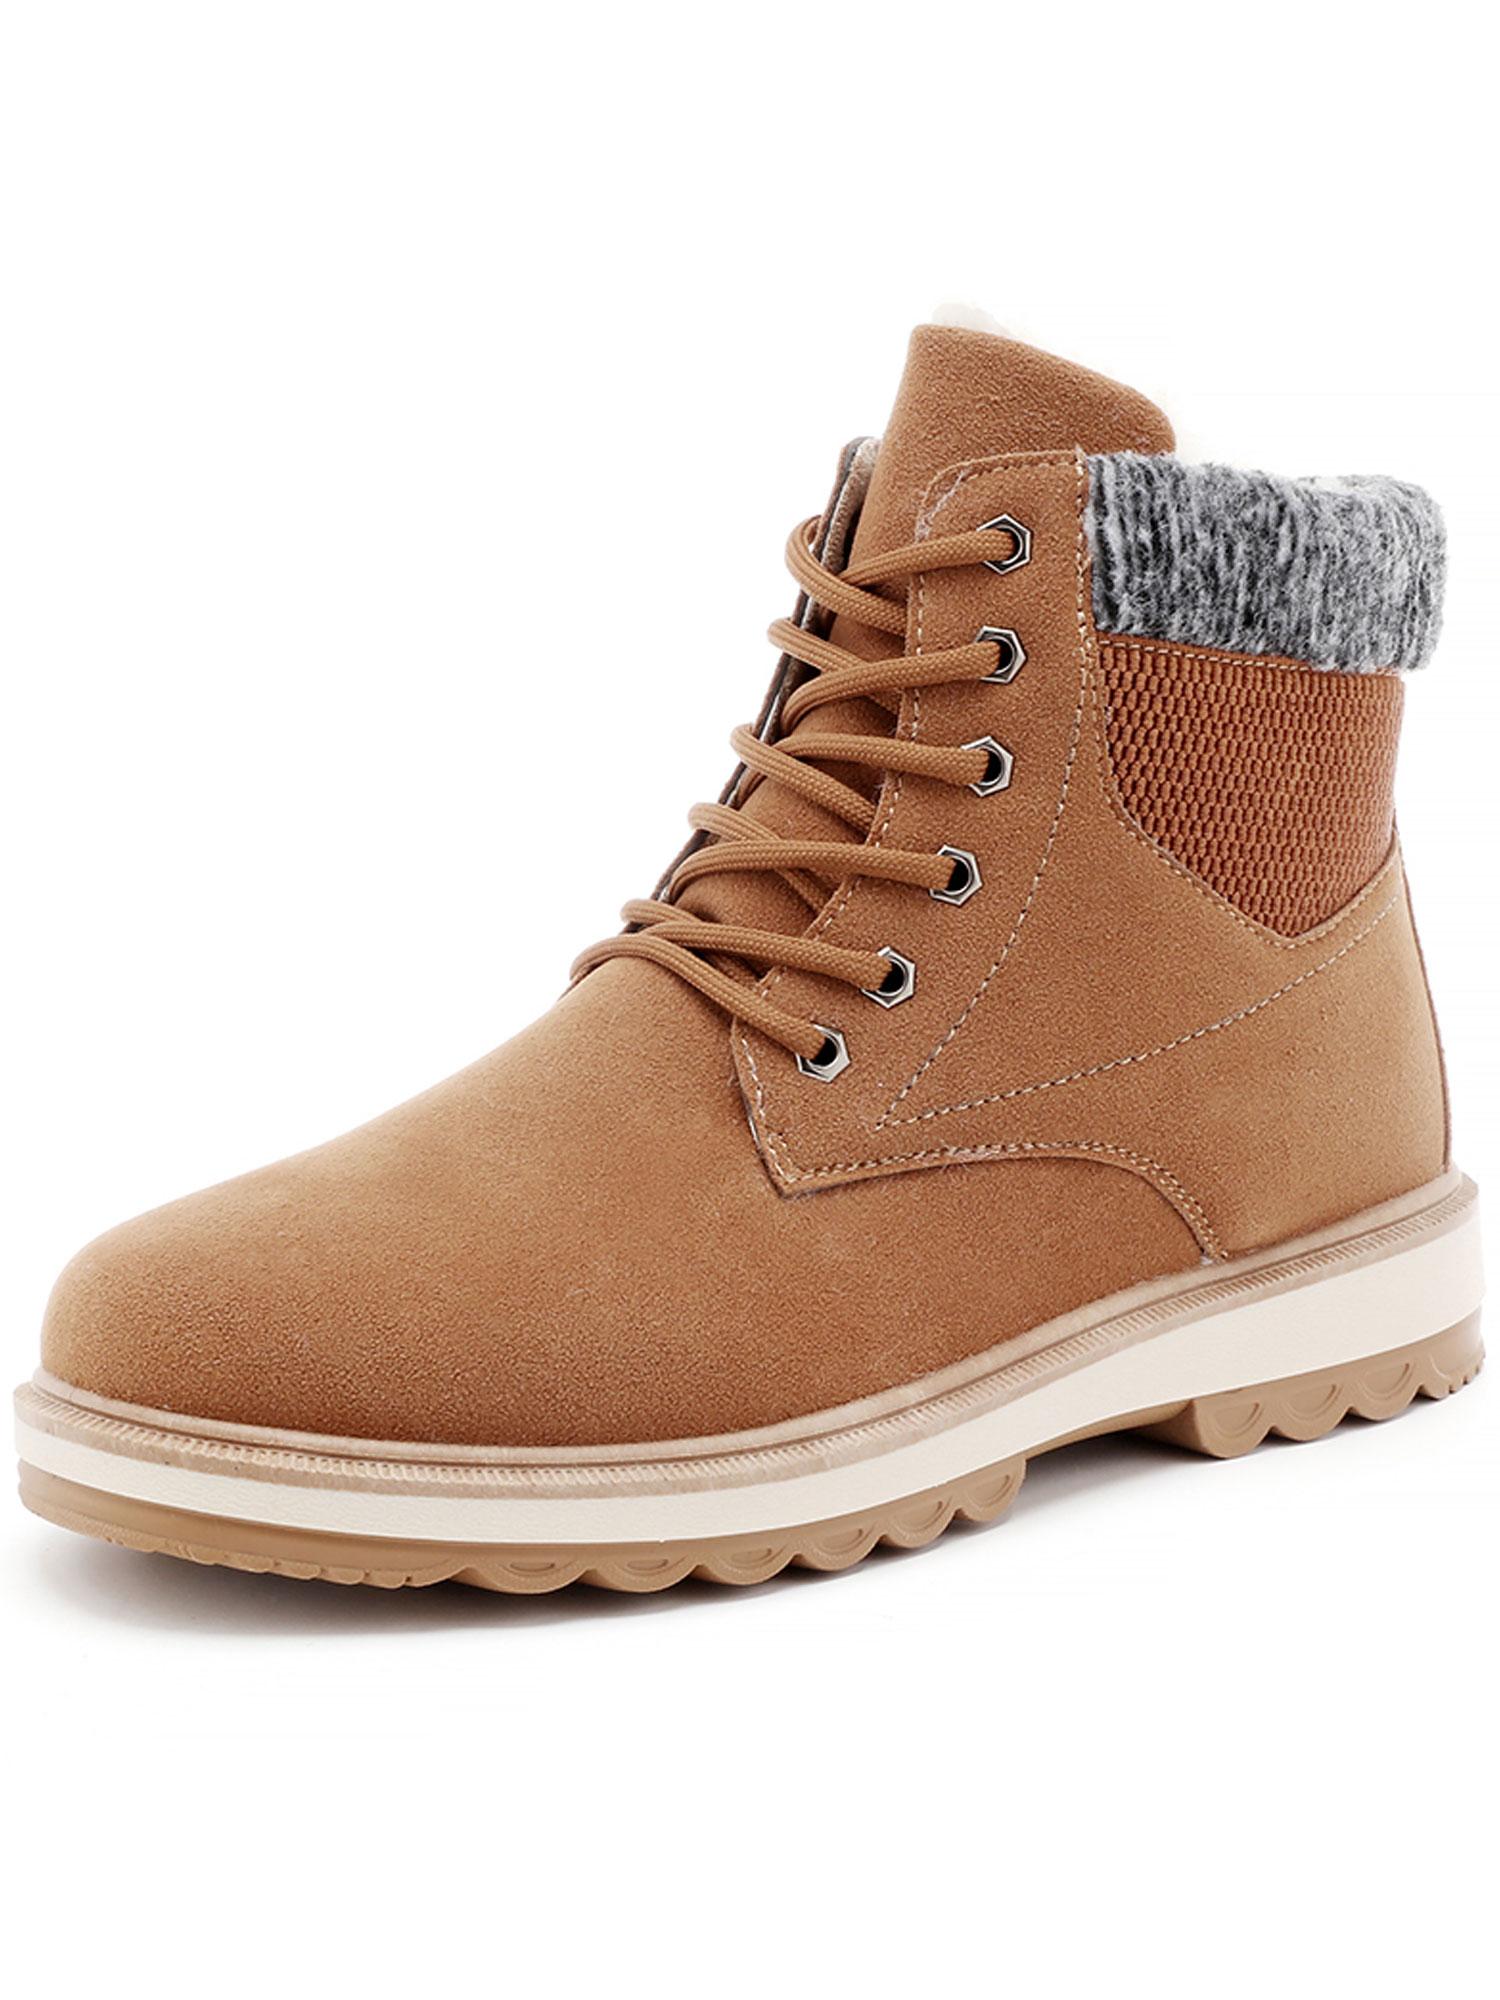 Tanleewa - Men's Snow Boots Waterproof